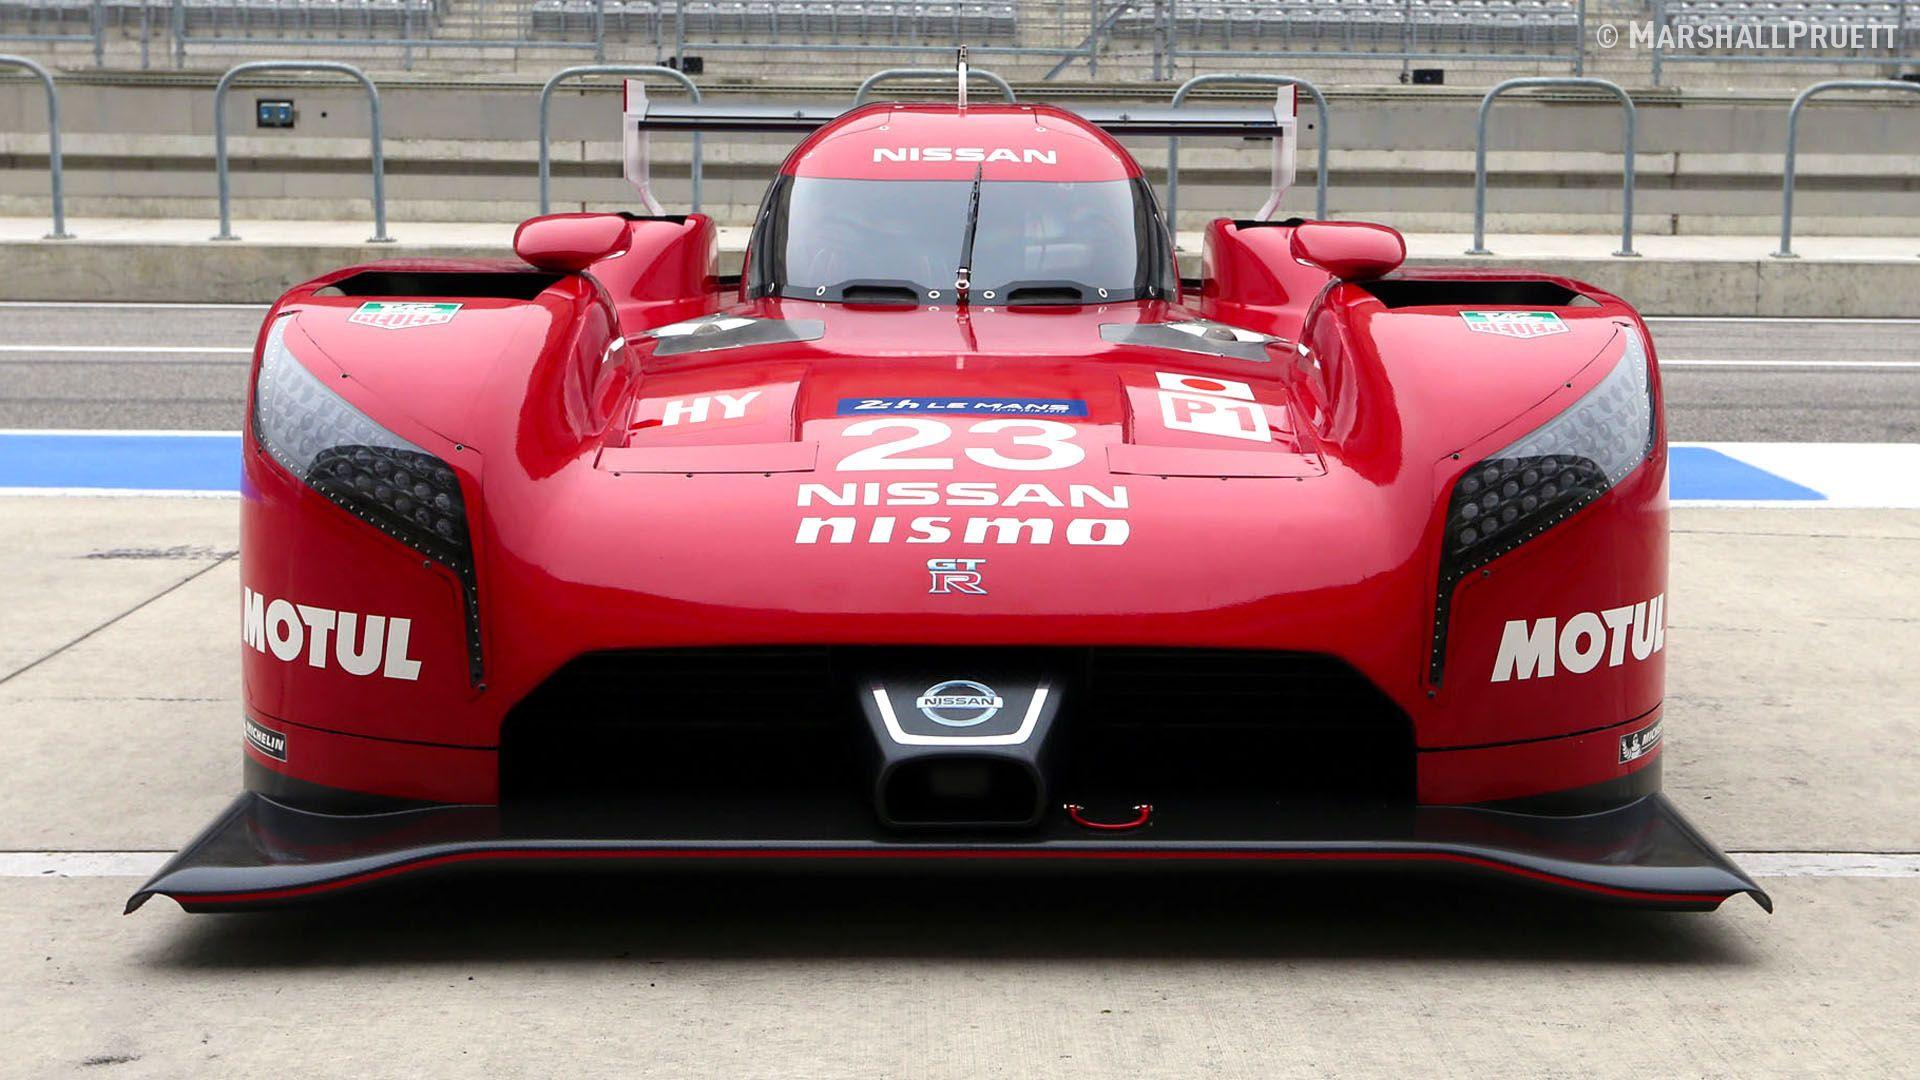 Nissan GT-R LM NISMO - Racecar Engineering